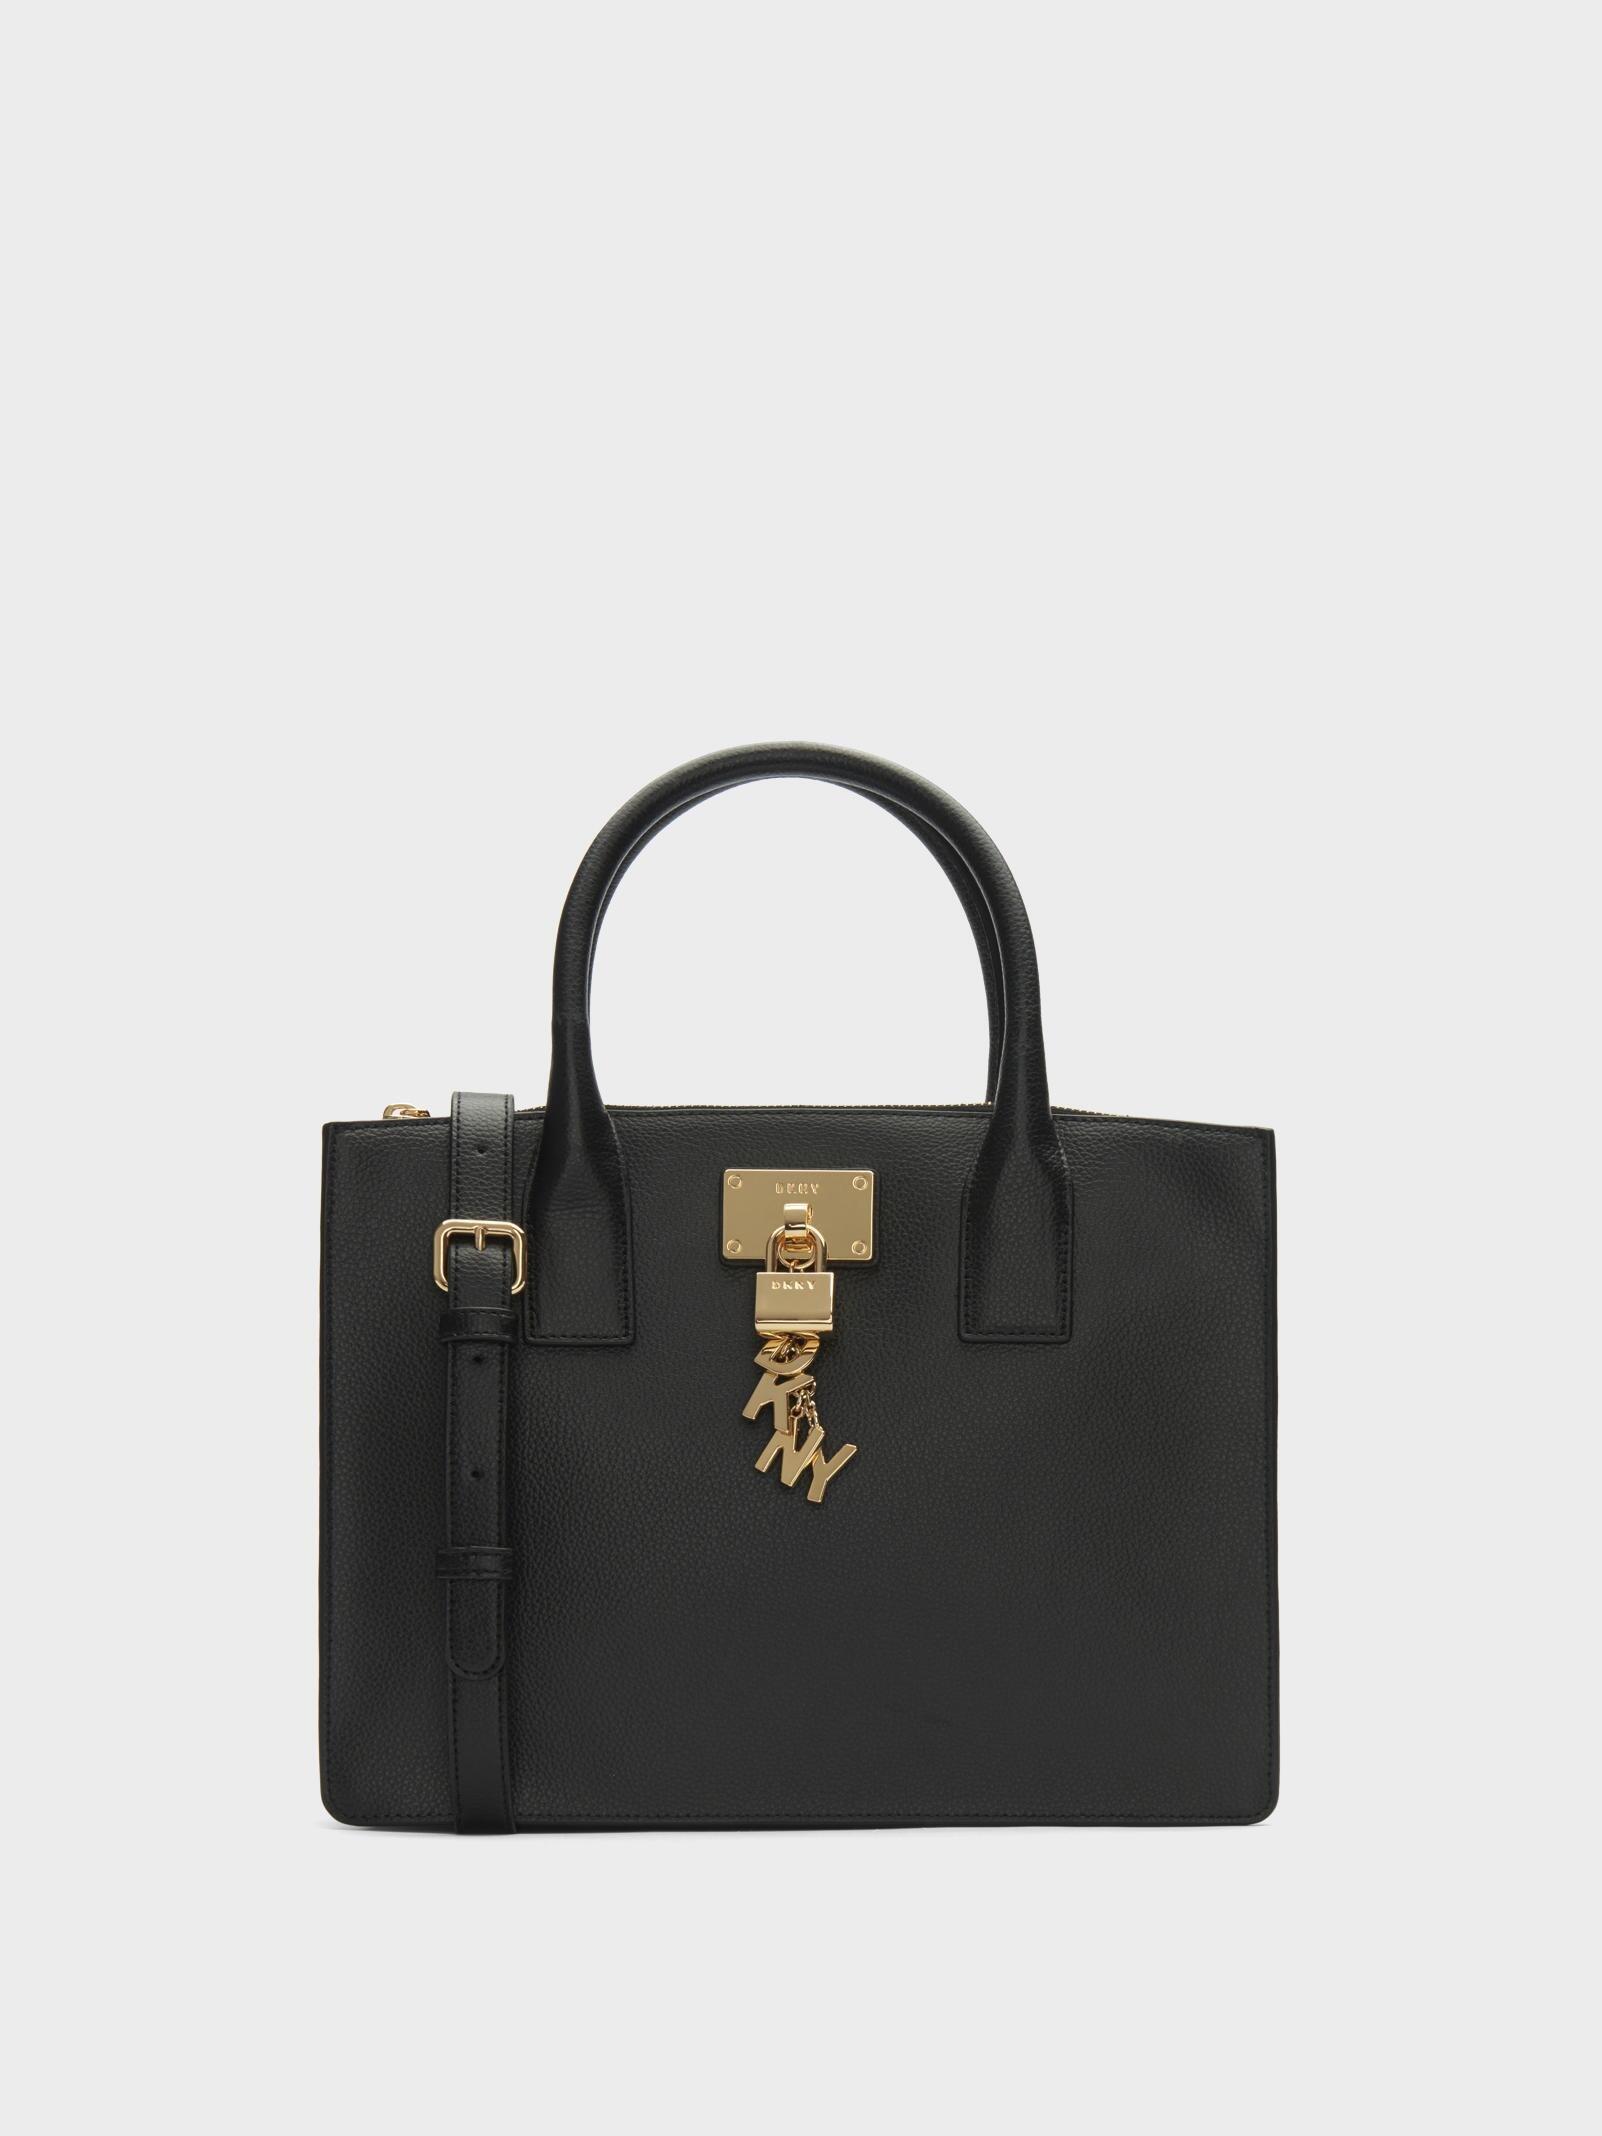 Tote - Elissa SM Tote Black/Gold - black - Tote for ladies DKNY erxPwx